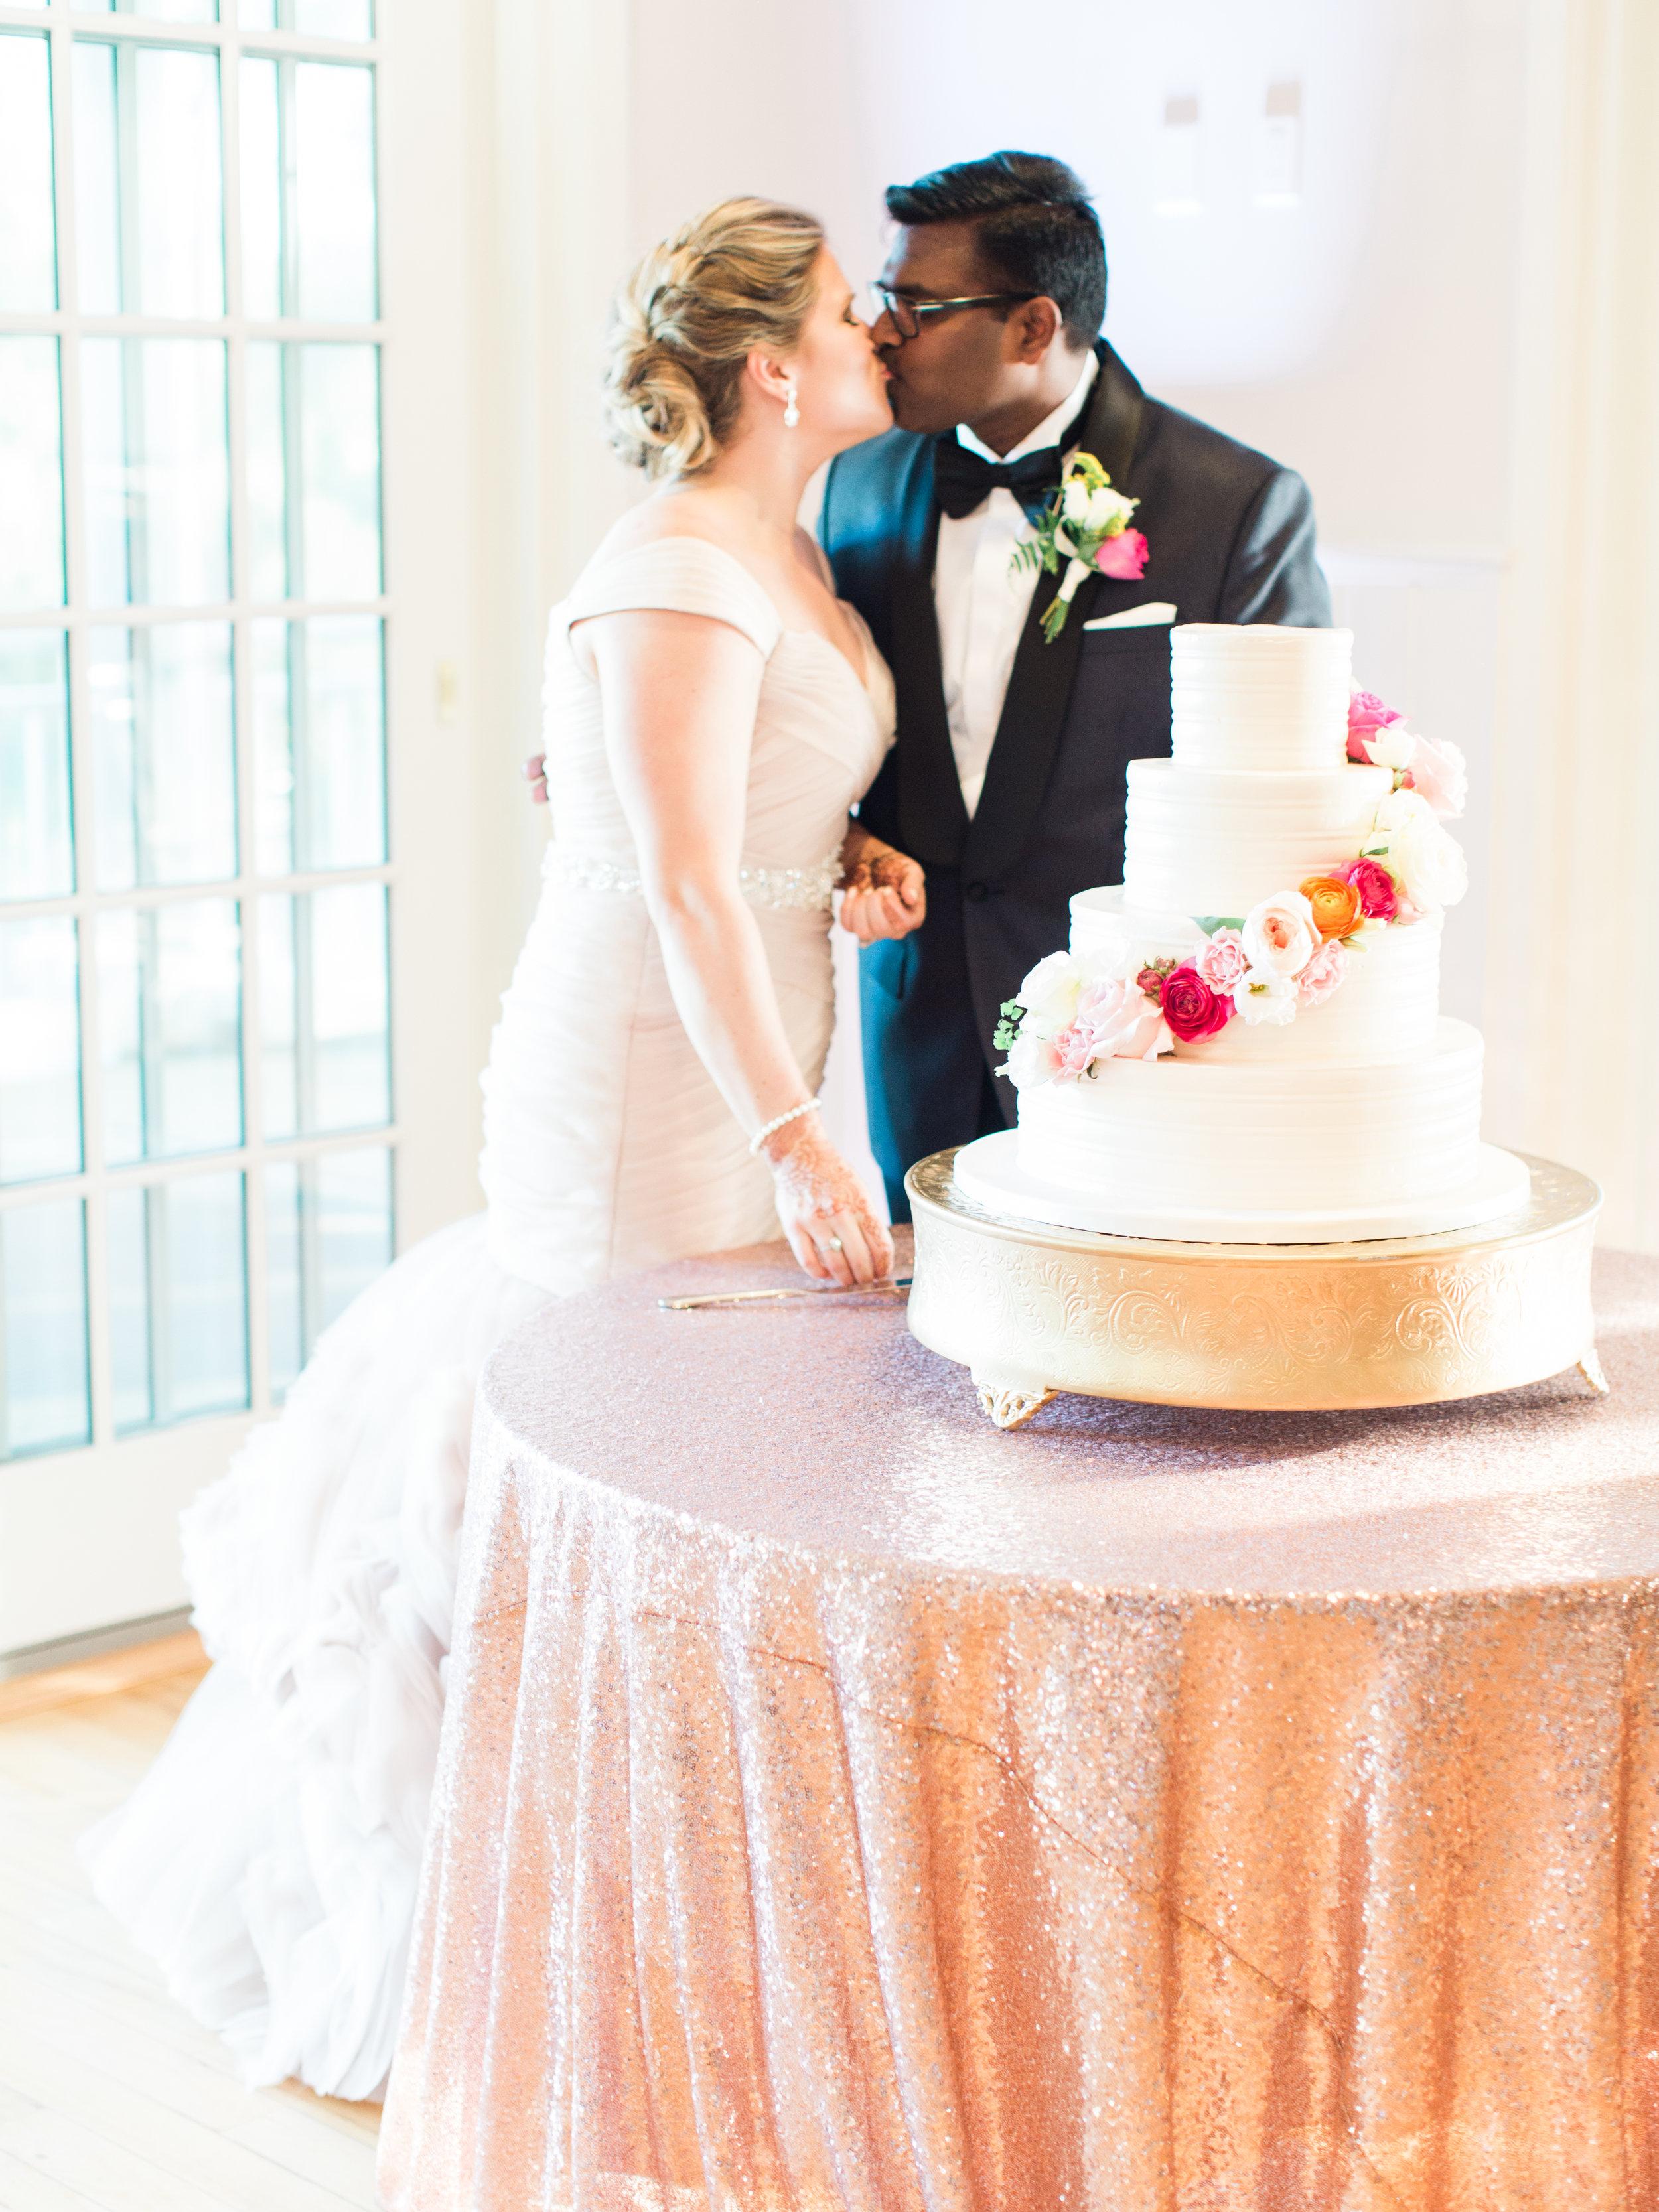 Govathoti+Wedding+Reception+Cake+Cutting-15.jpg